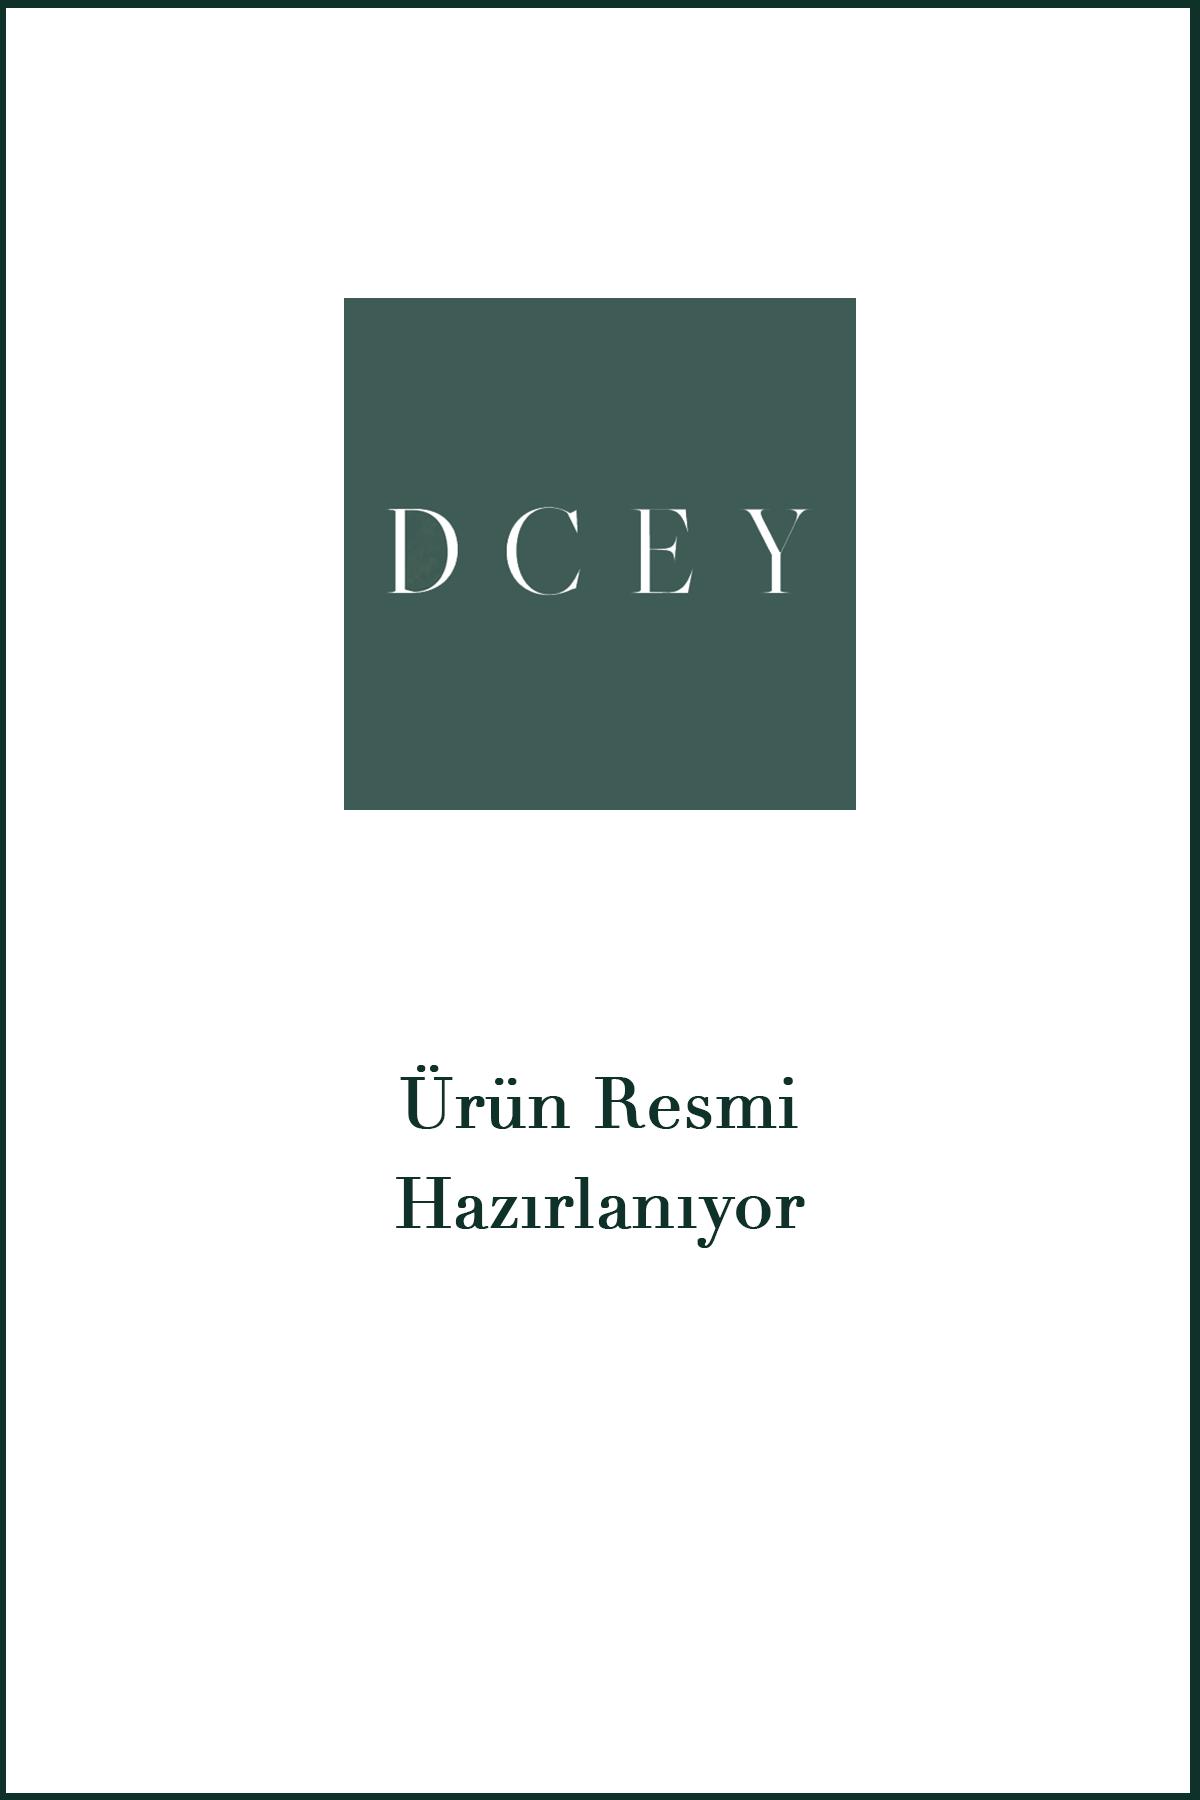 Gilded Roxy Elbise